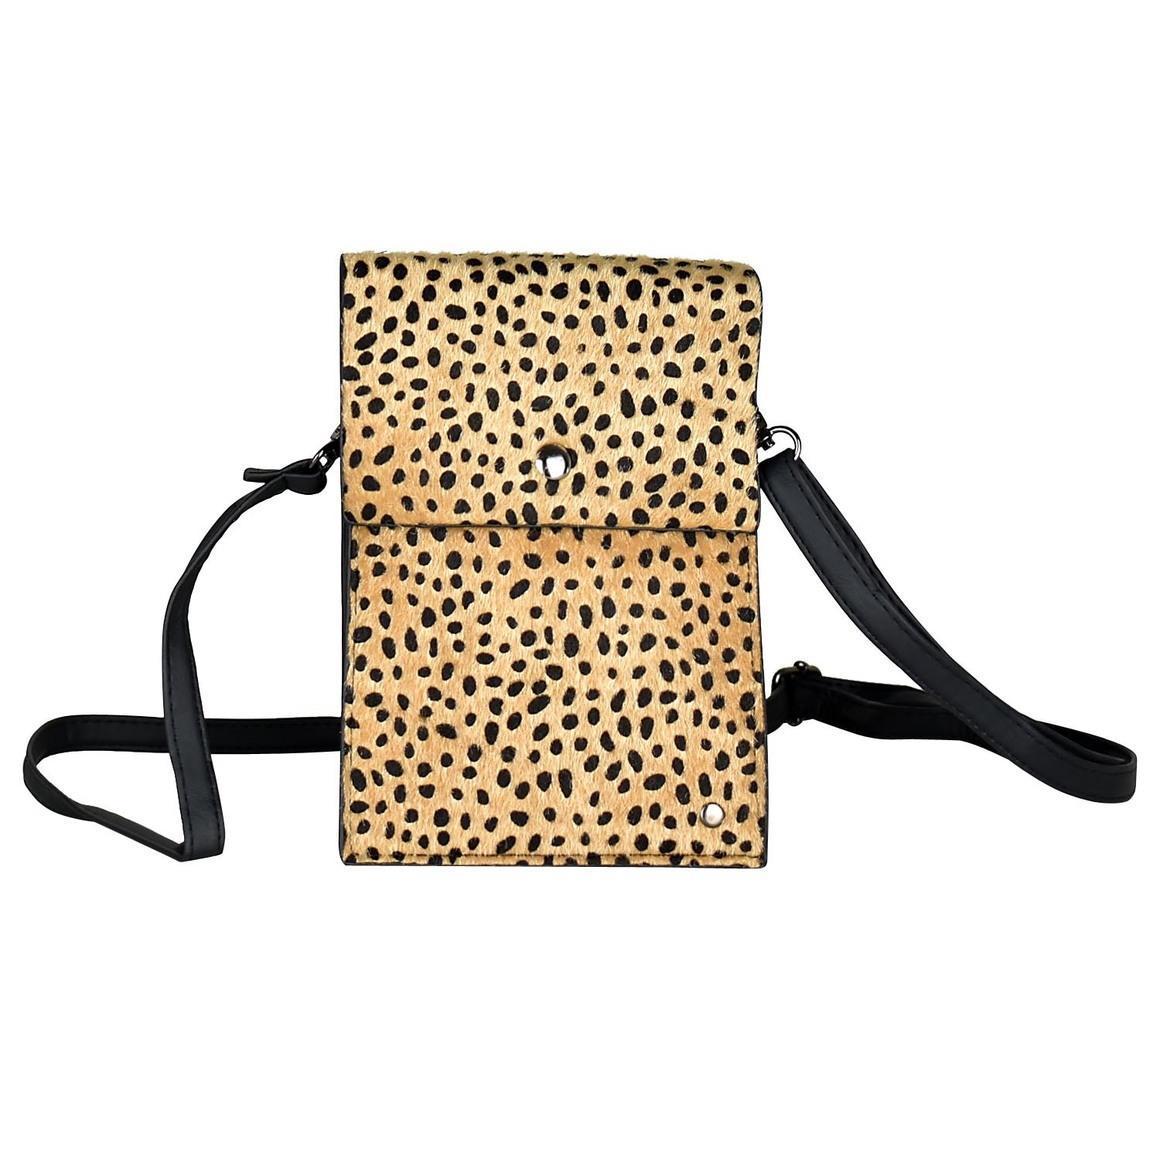 THSB1011: Brown: Animal Print Cross Bag | Trada Marketplace